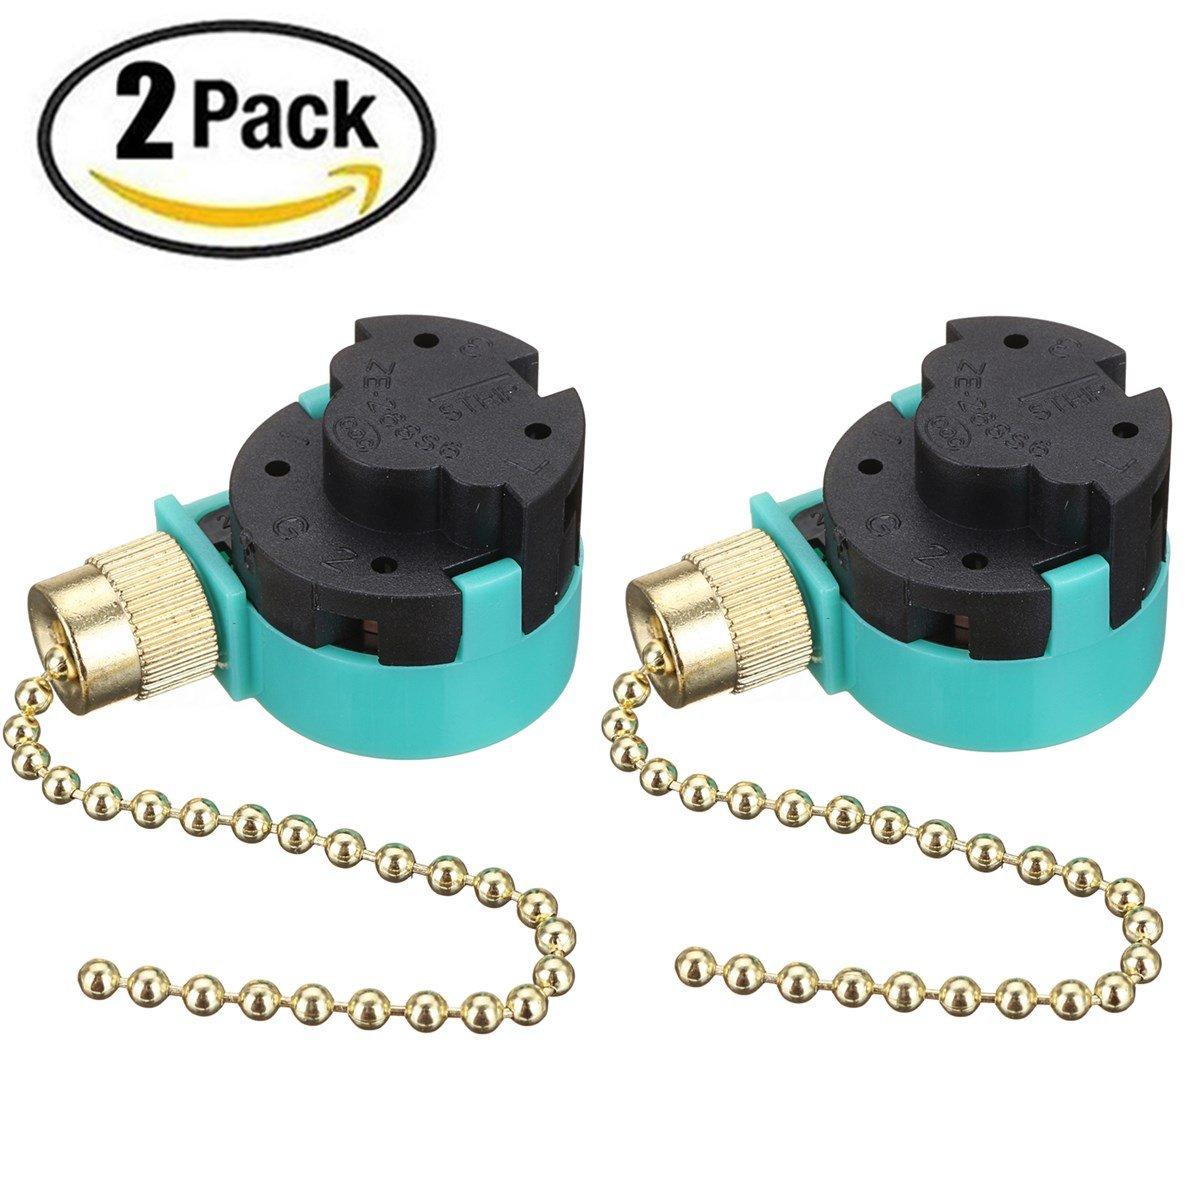 2PCS Ceiling Fan Switch Pull Chain Control ZE-268S6 ZE-208S6 3 Speed 4 wire Speed Control Switch Ceailing Fan Replacement Speed Control Switch (Brass)